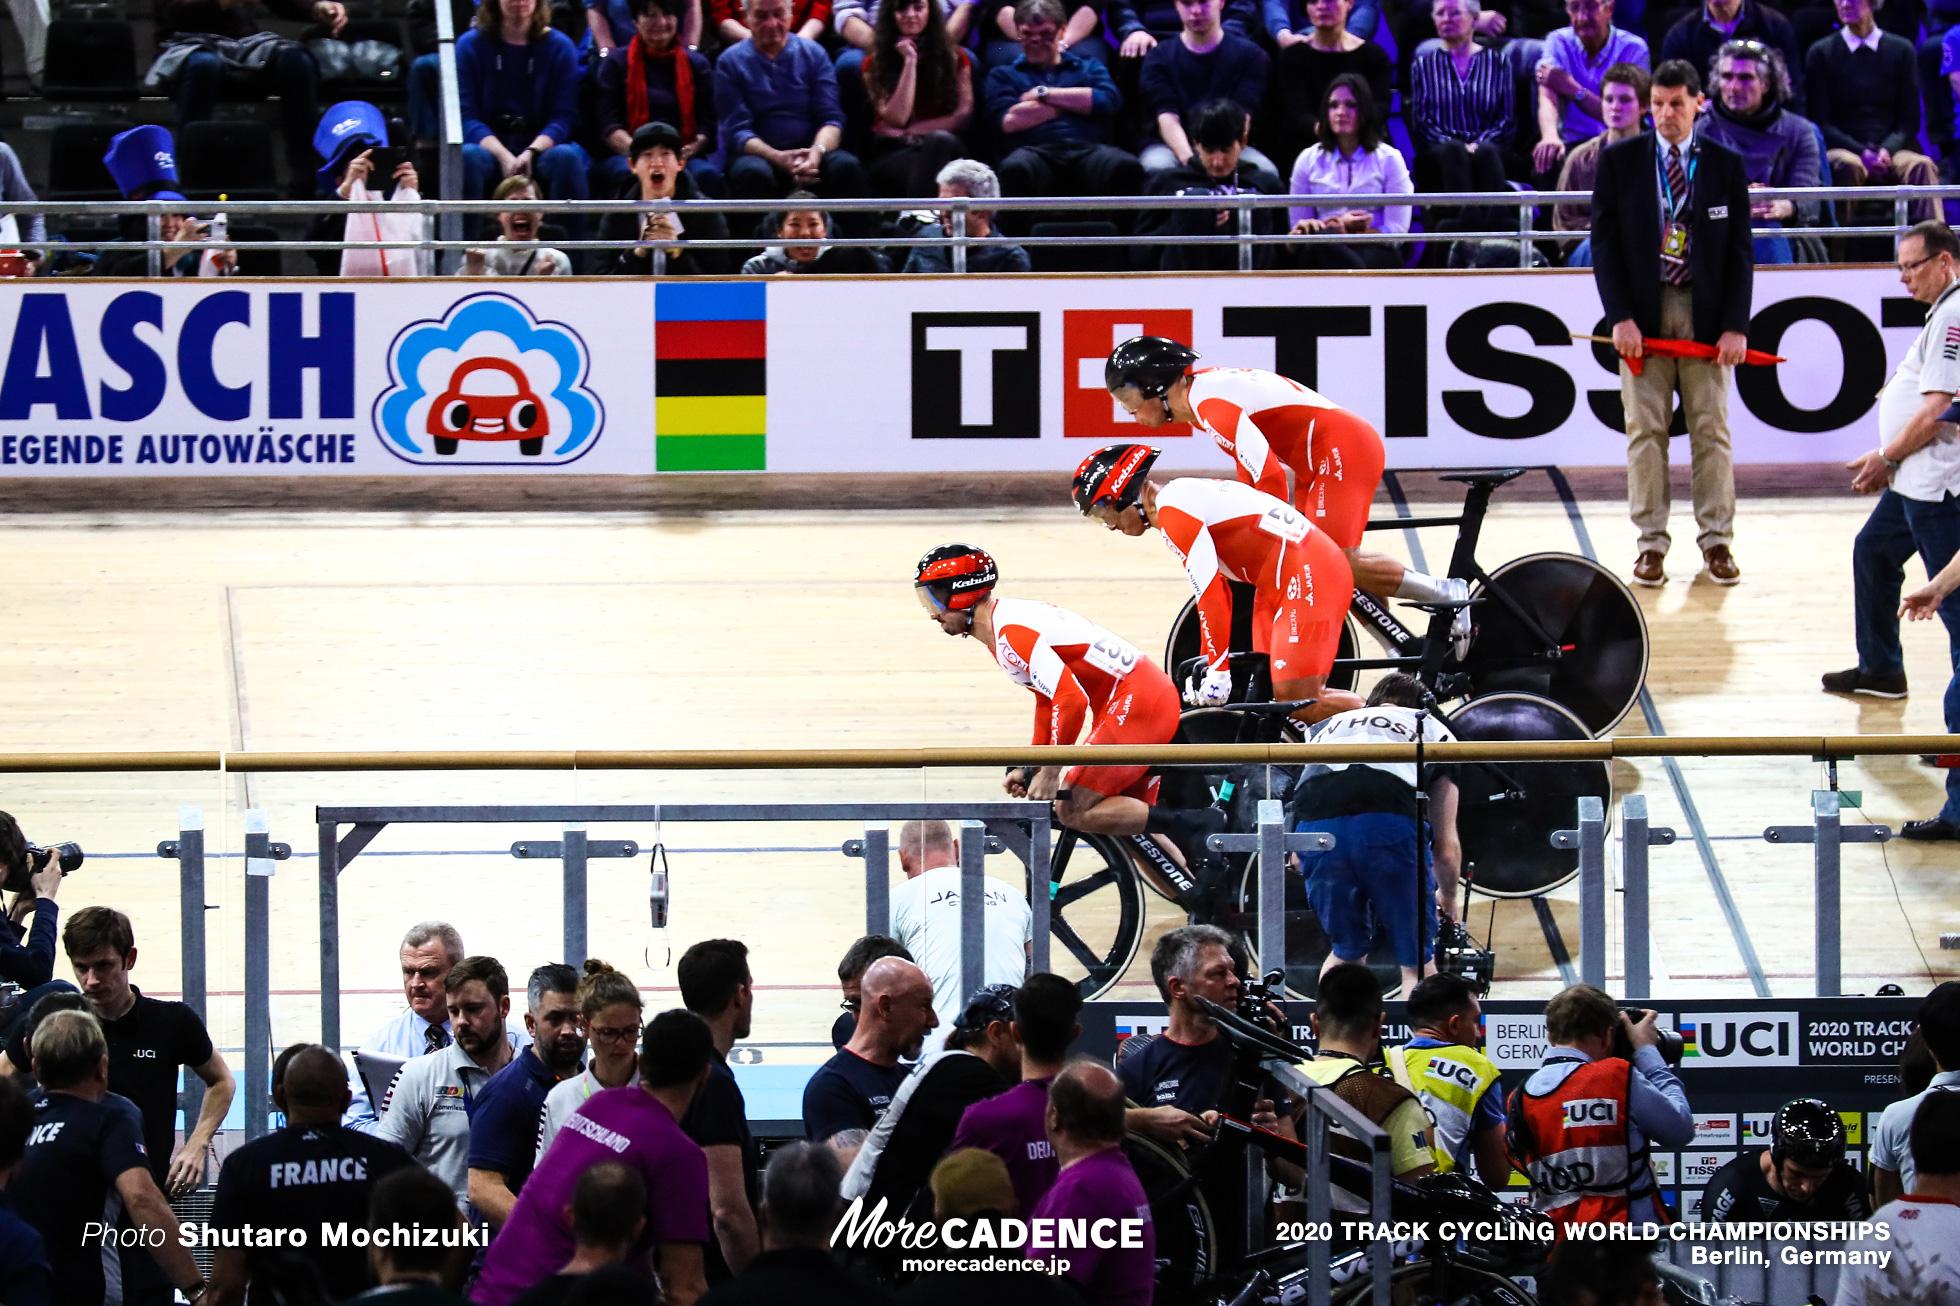 Qualifying / Men's Team Sprint / 2020 Track Cycling World Championships, 雨谷一樹 Amagai Kazuki, 新田祐大 Nitta Yudai, 深谷知広 Fukaya Tomohiro